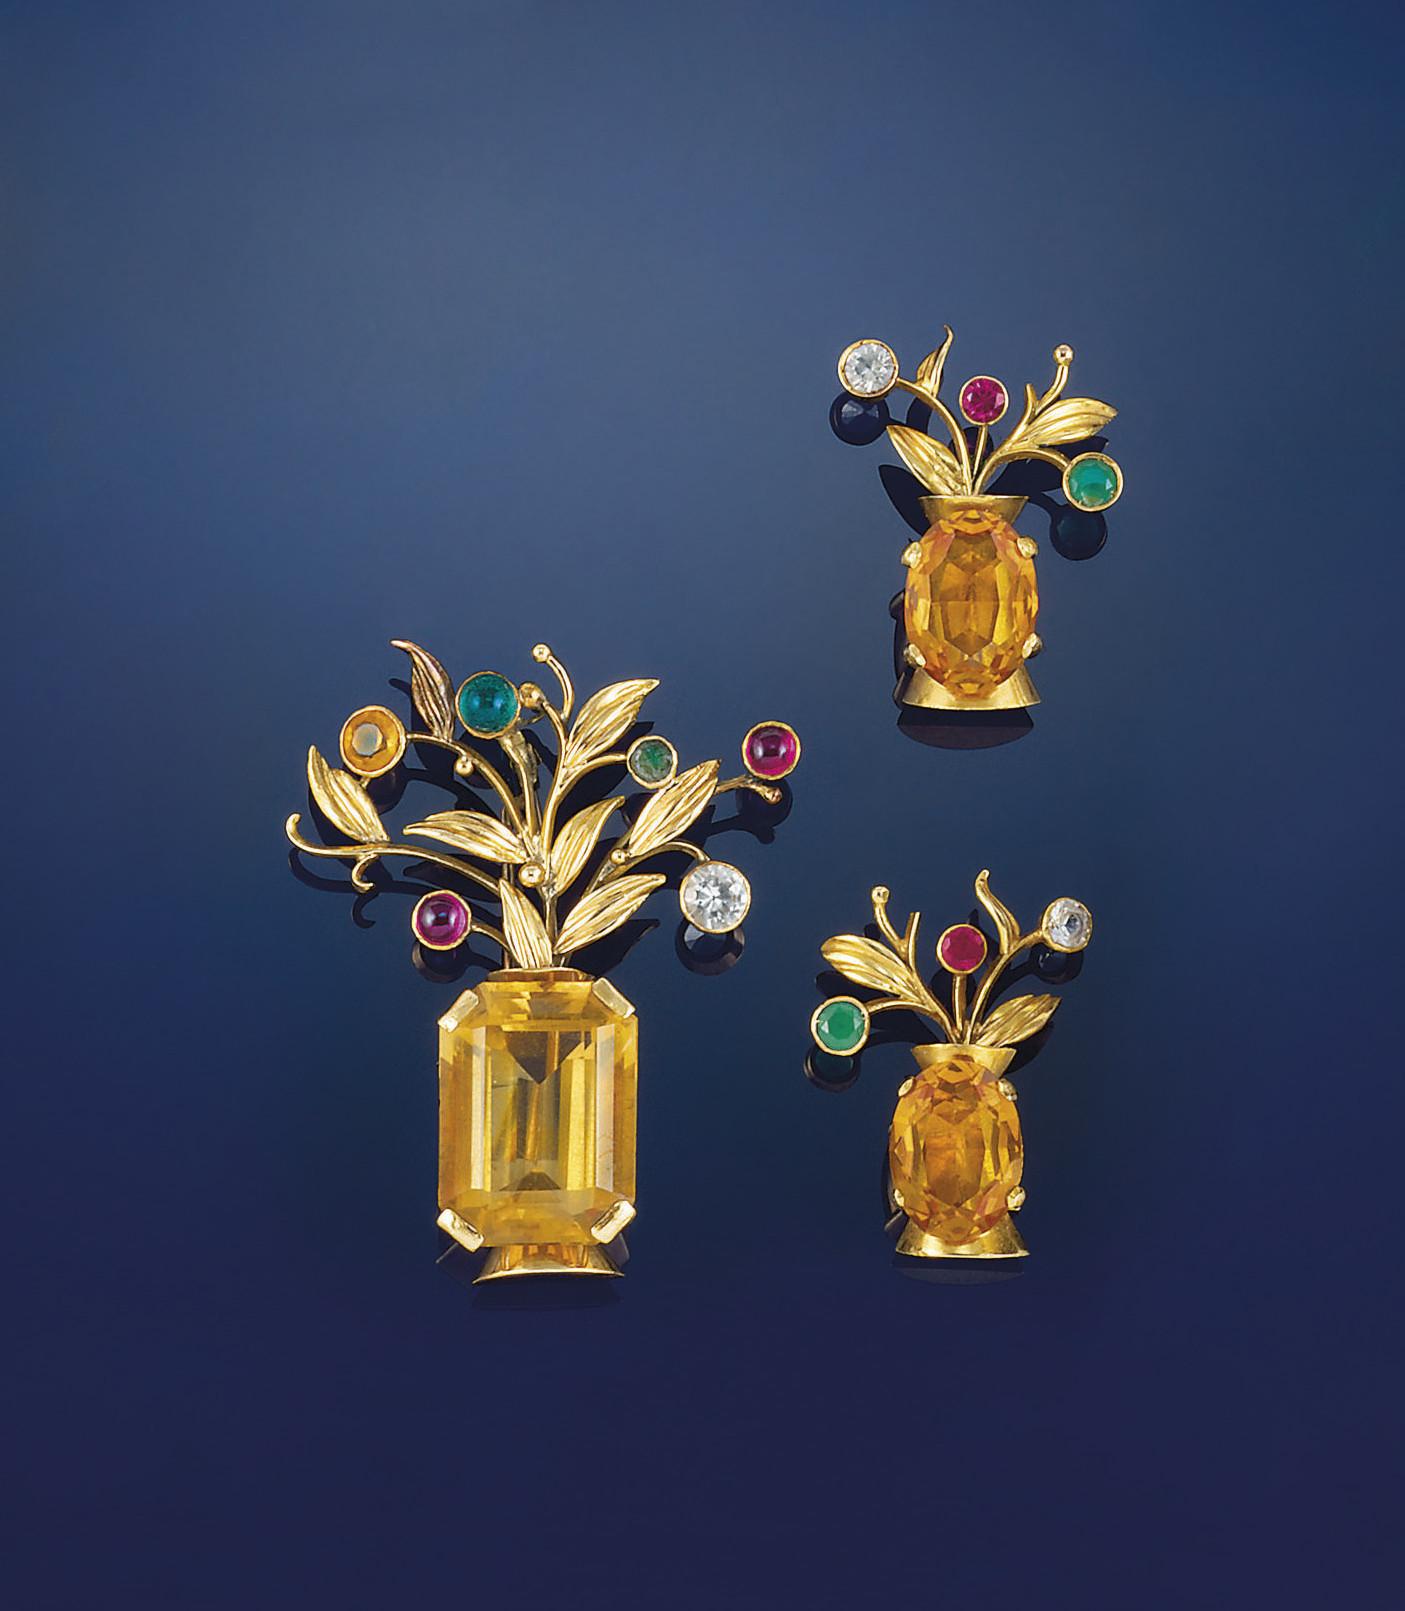 A citrine and gem-set brooch a